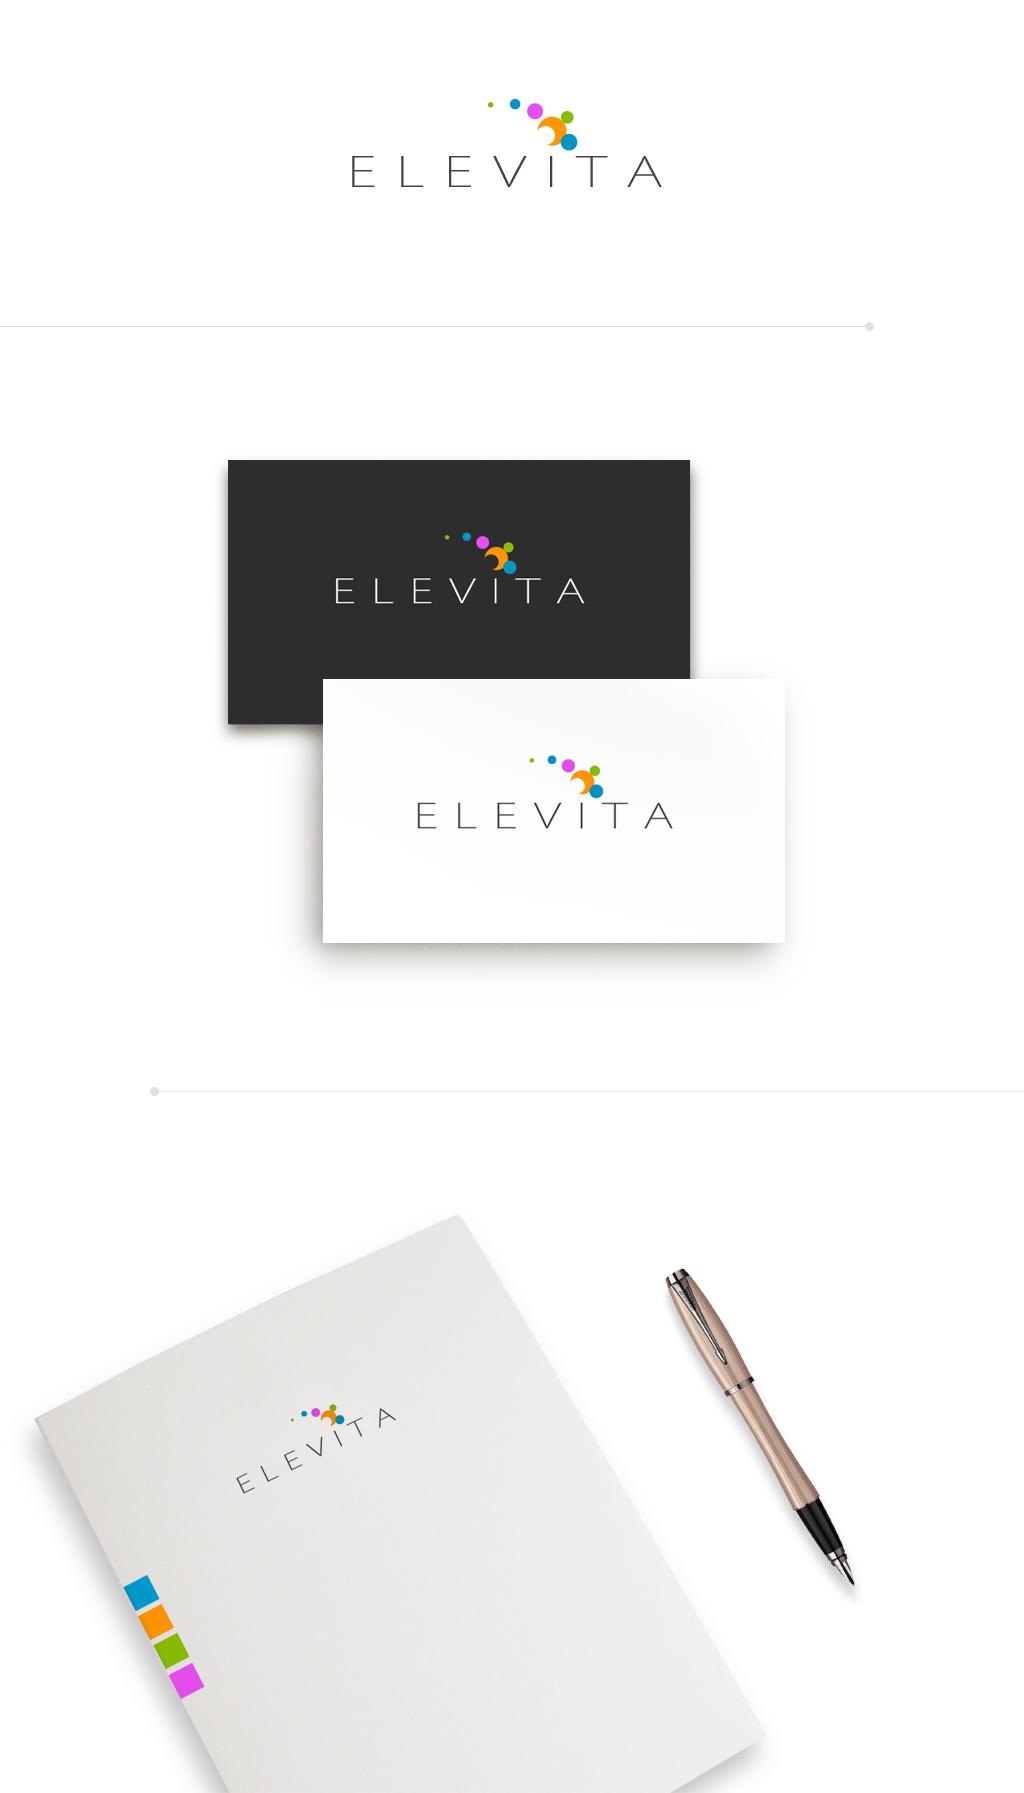 Логотип для интернет-магазина косметики и парфюмерии Elevita